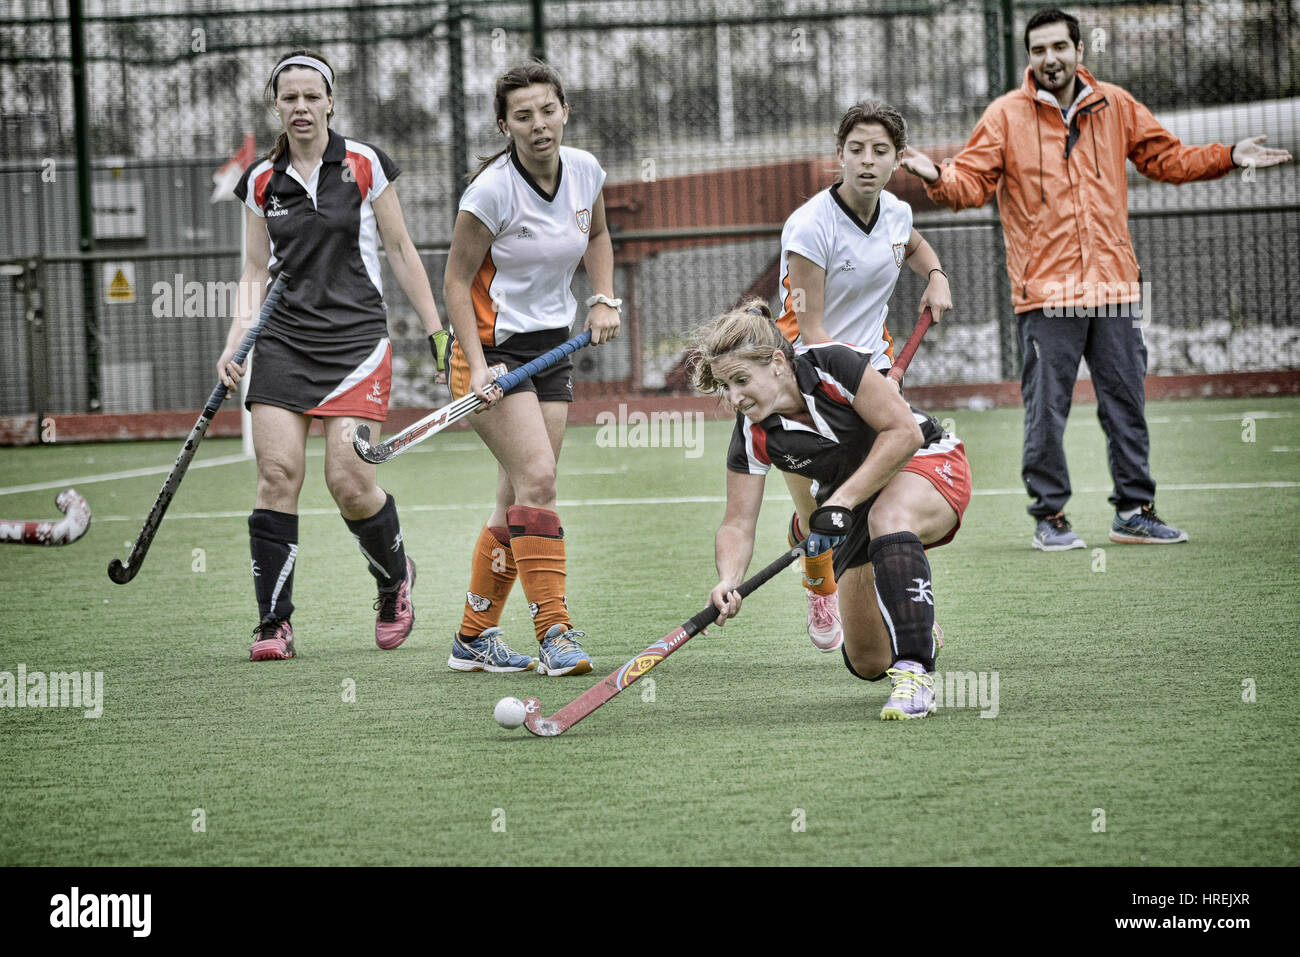 Gibraltar Hockey - Grammarians HC playing friendly against San Fernando HC from Cadiz. - Stock Image